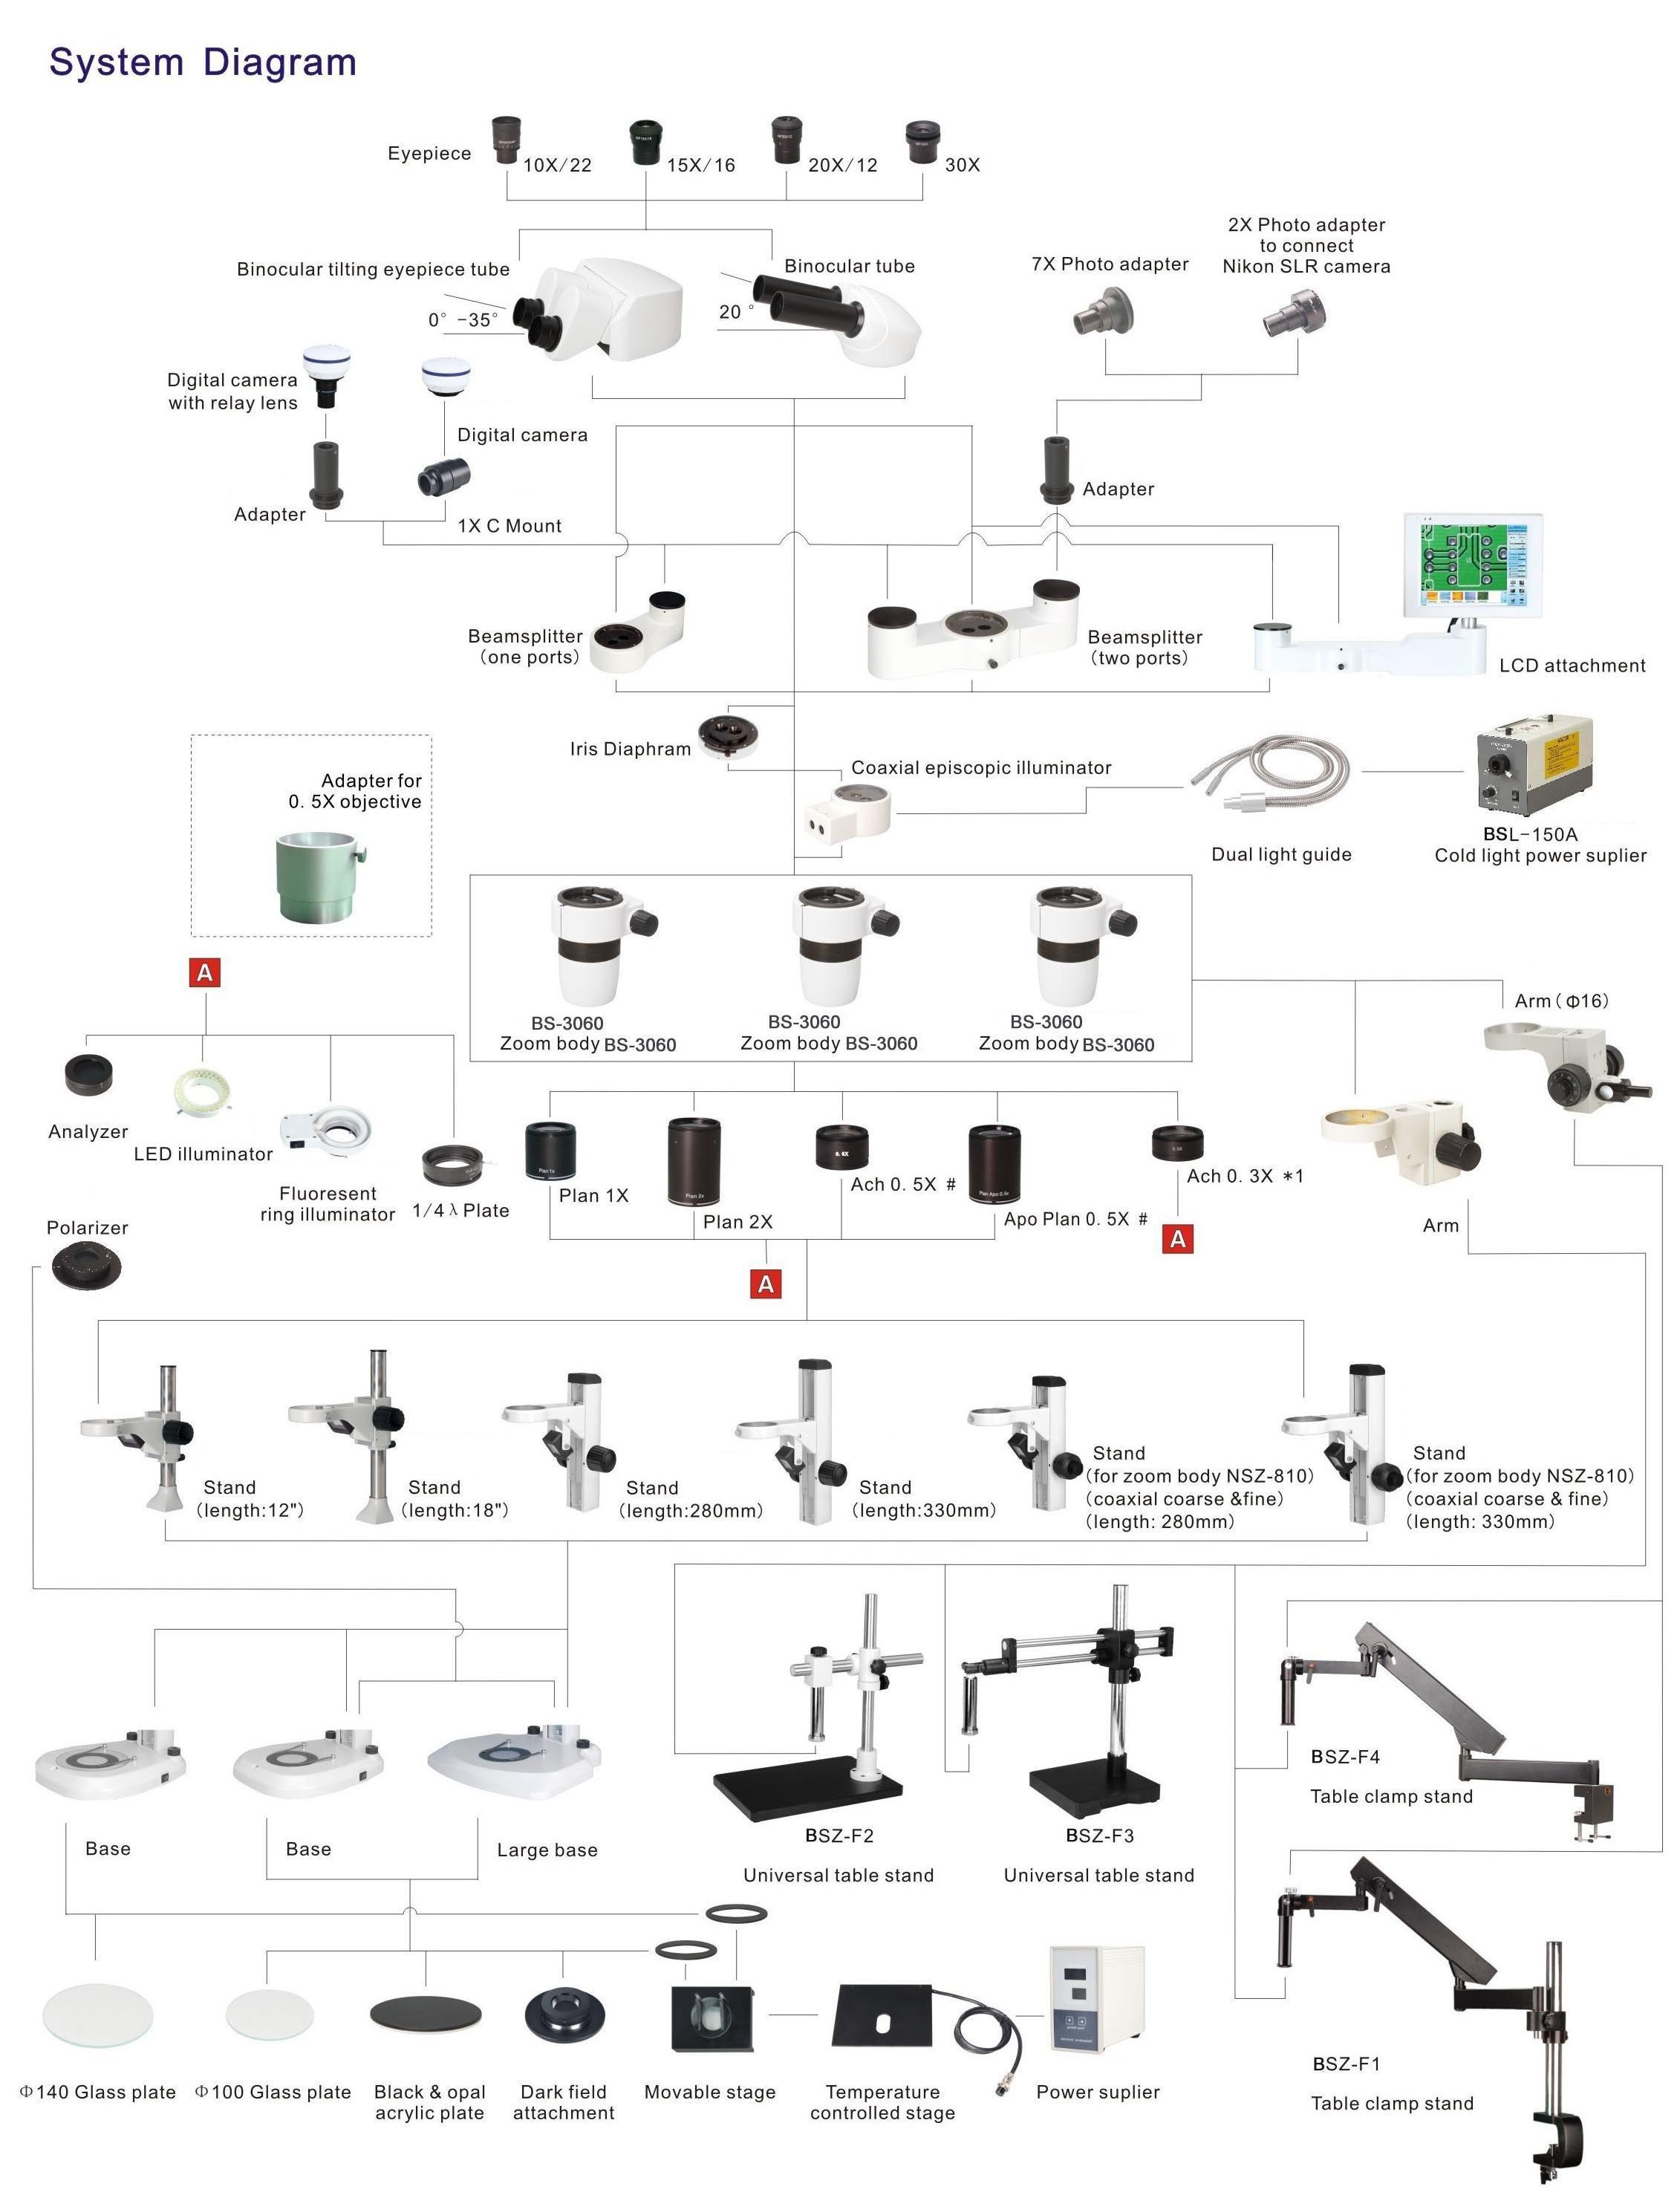 Bsm500fl Stereo Epifluorescence Microscope Nikon Smz800